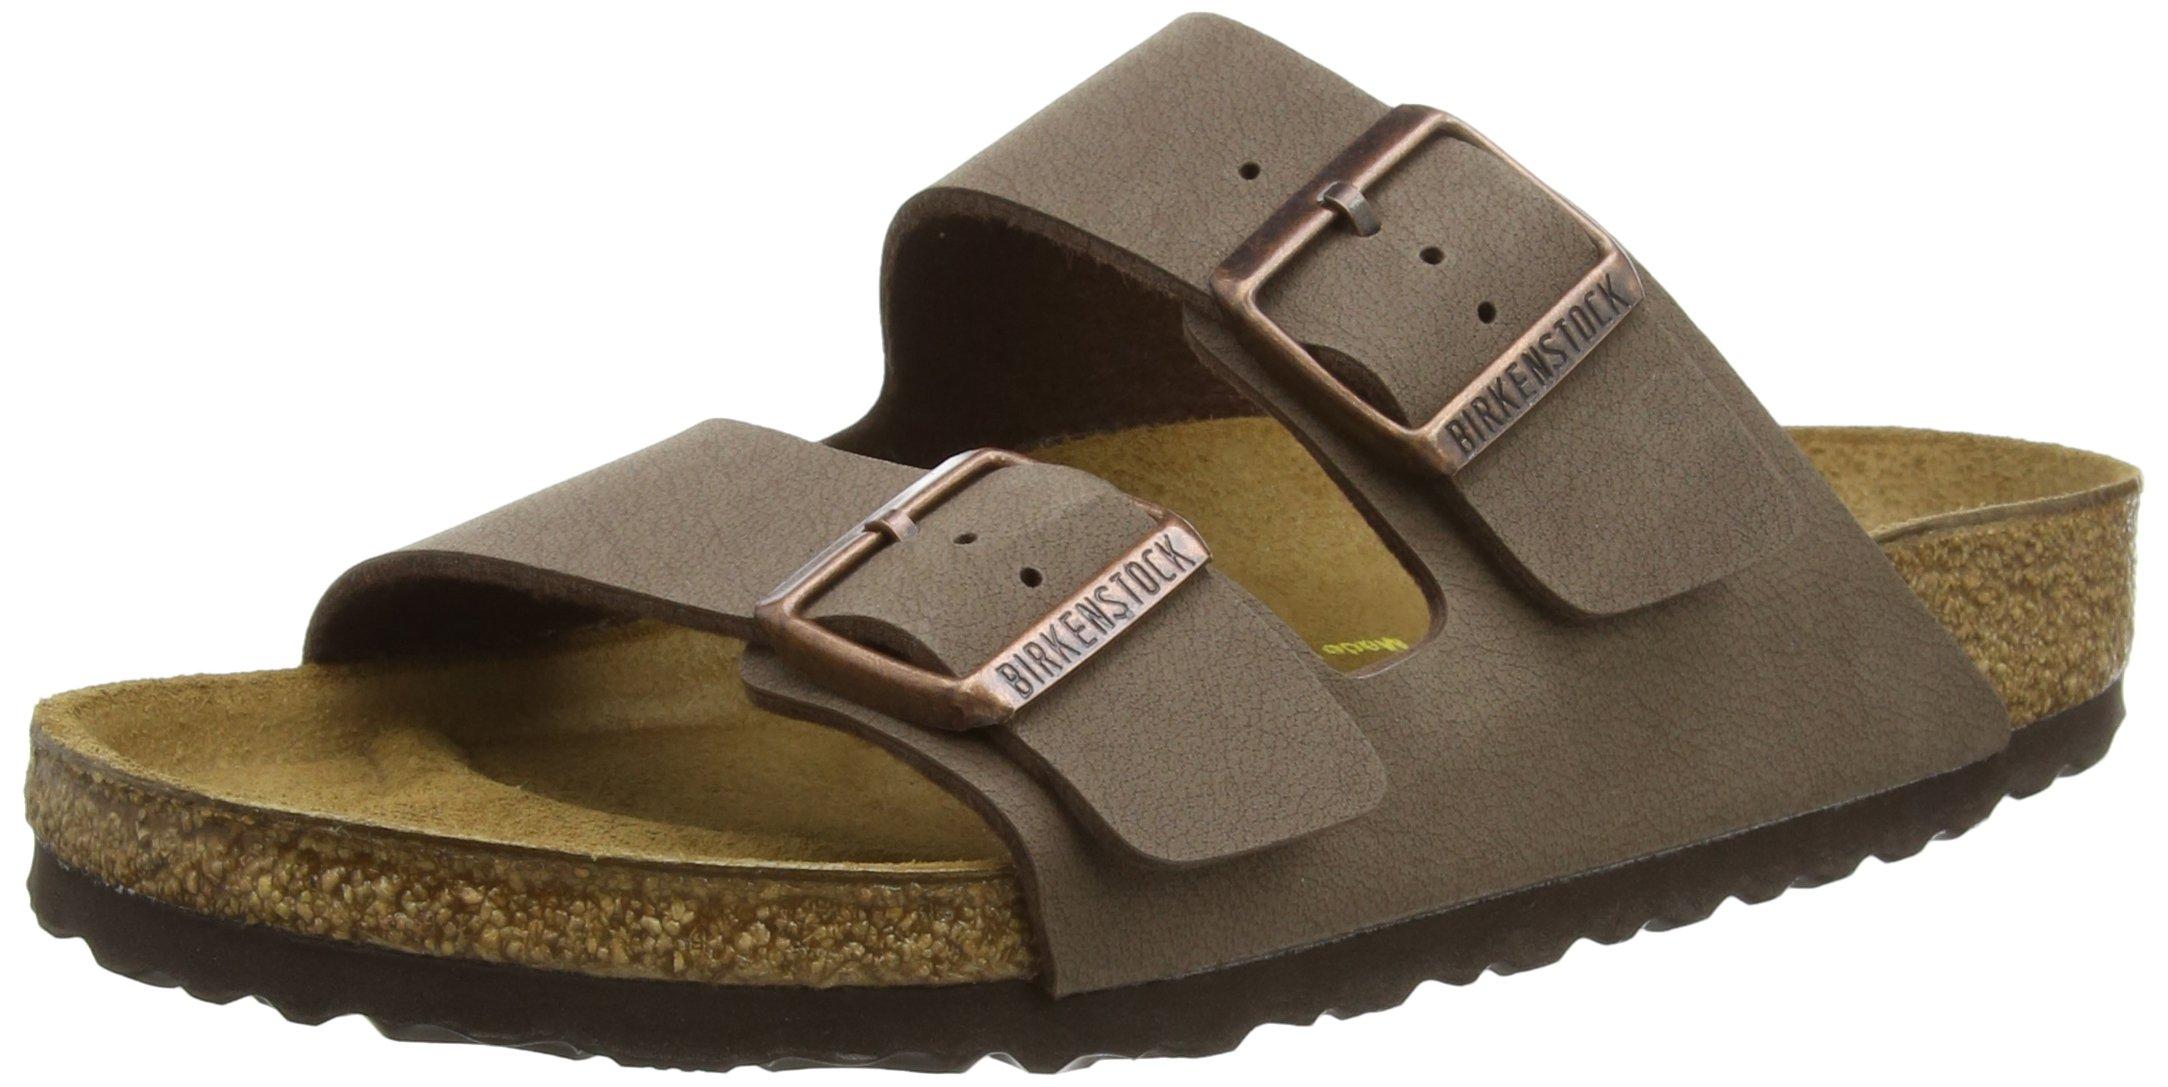 Birkenstock Women's Arizona  Birko-Flo Mocca Sandals - 42 M EU